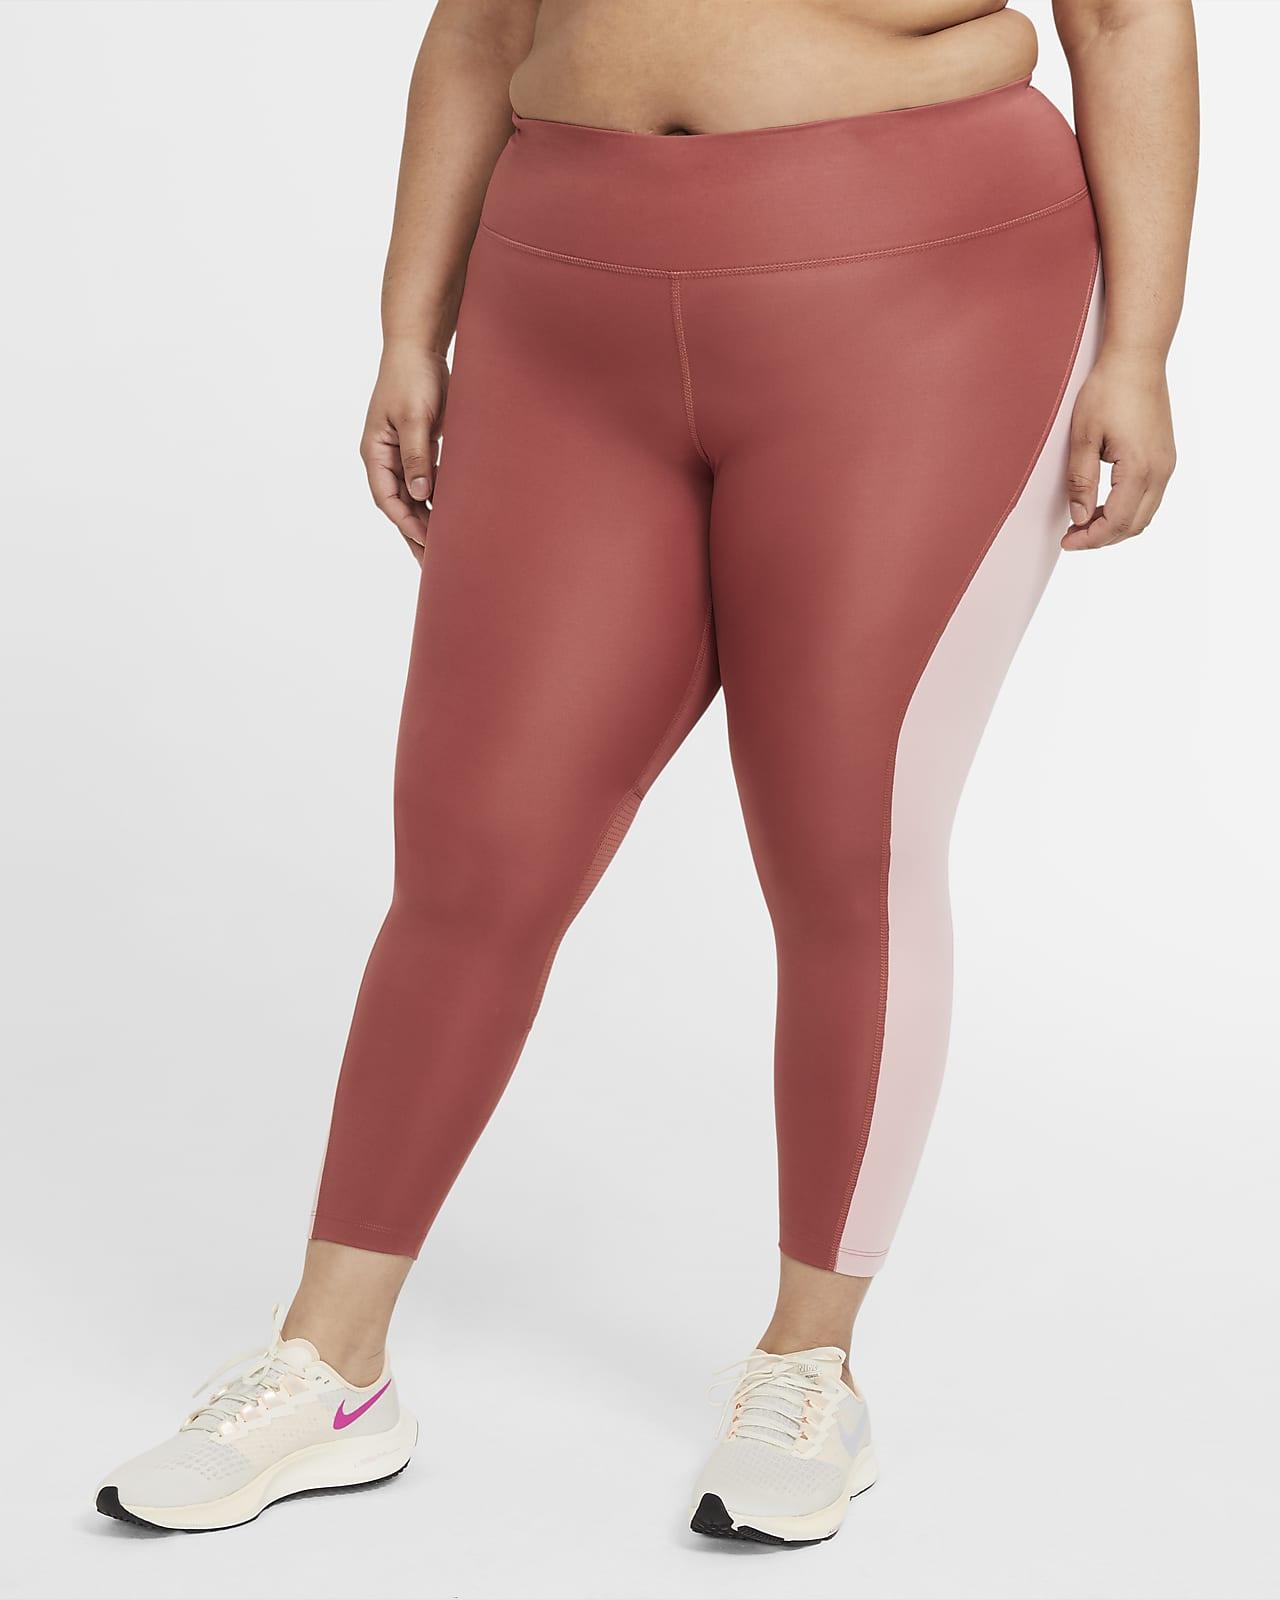 Nike Epic Fast Women's Mid-Rise 7/8 Running Leggings (Plus Size)